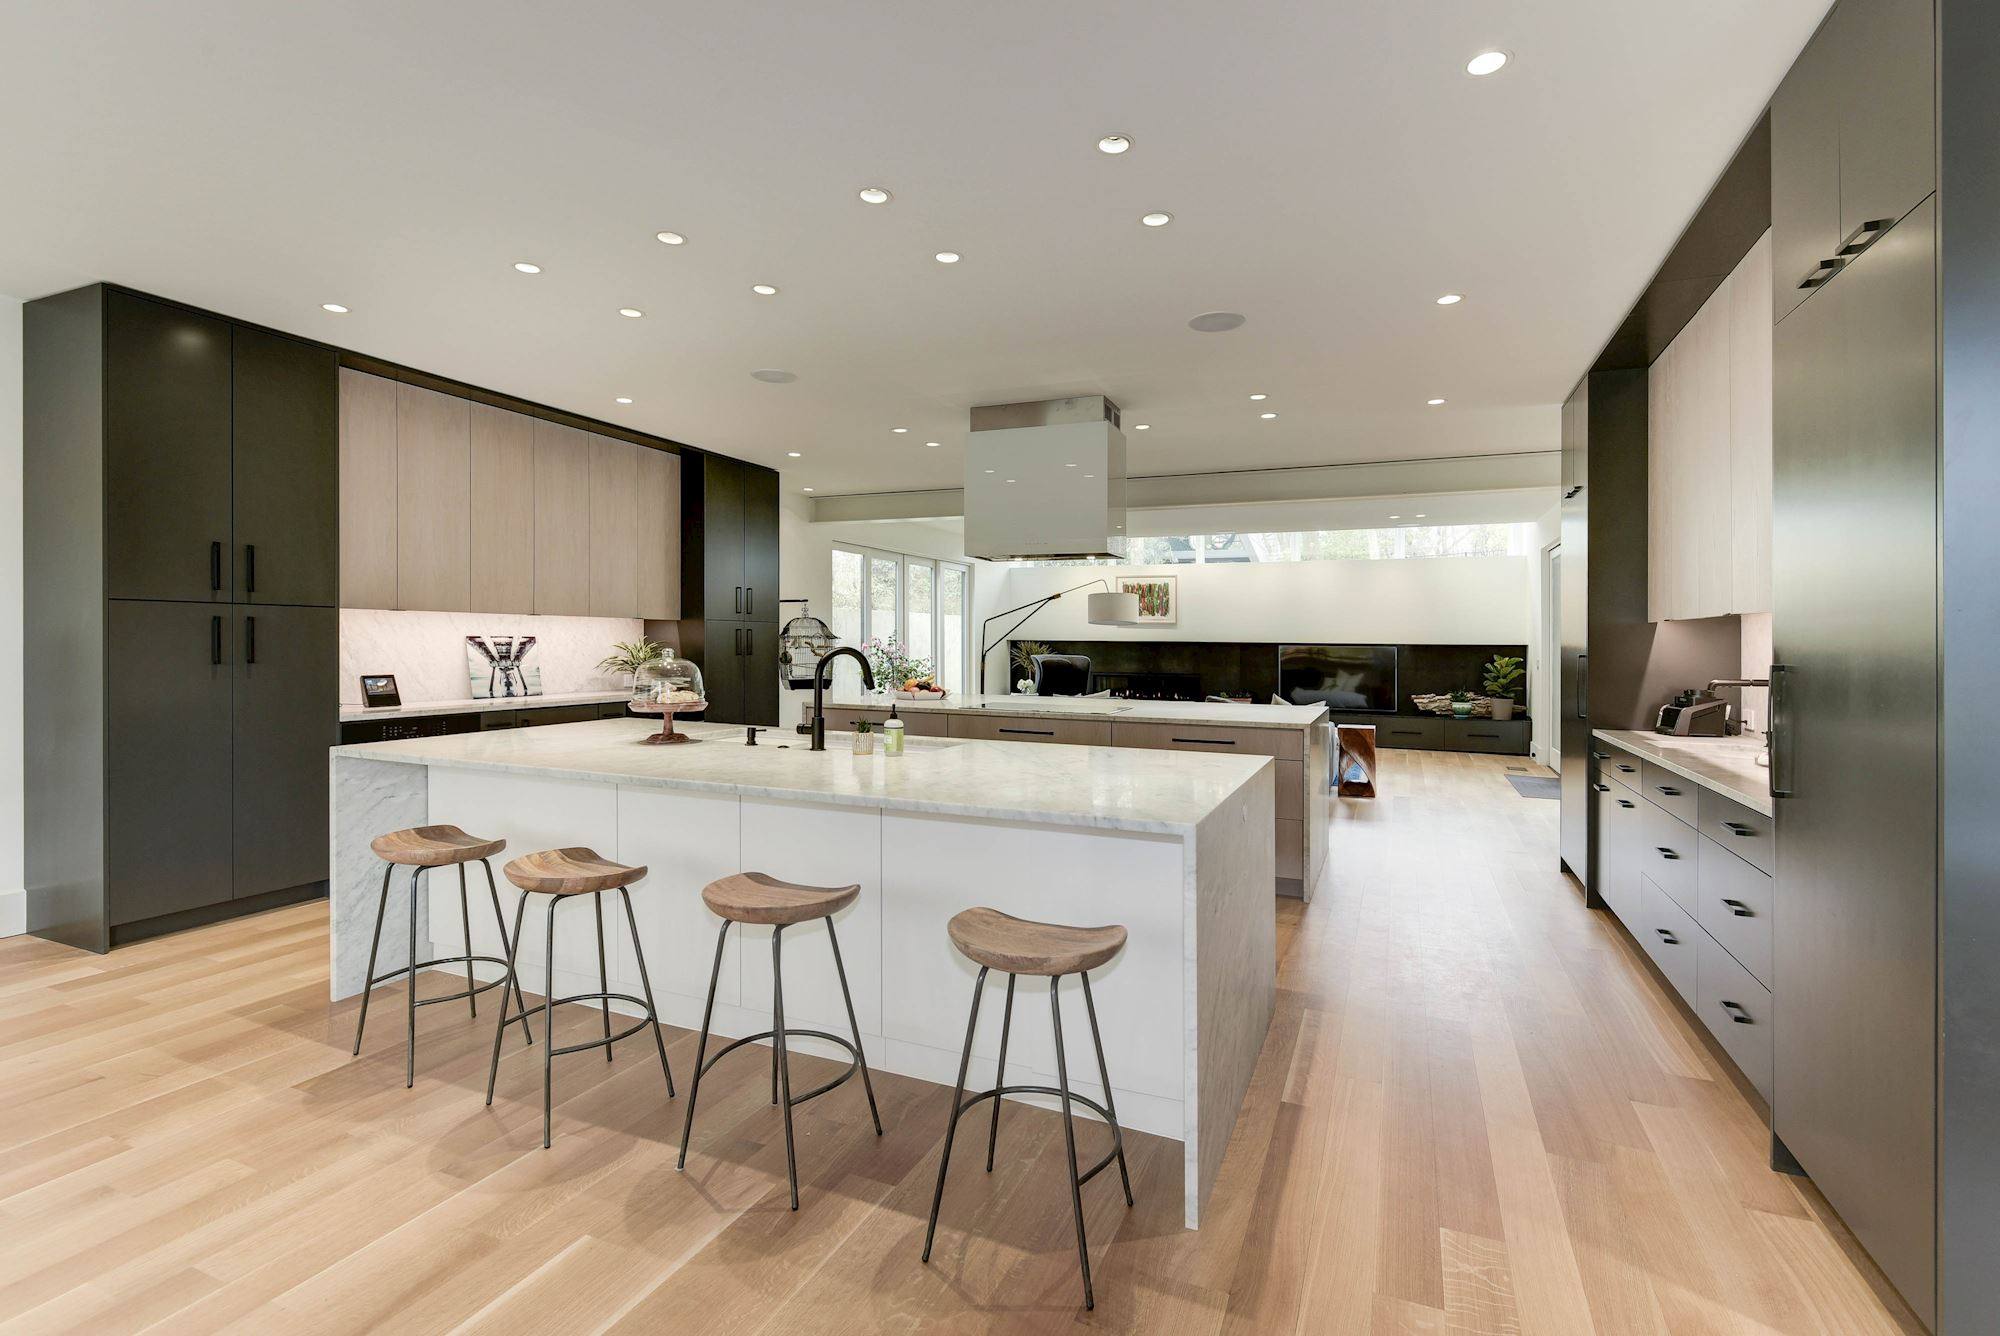 Woodbrier - Adelphi Kitchens & Cabinetry